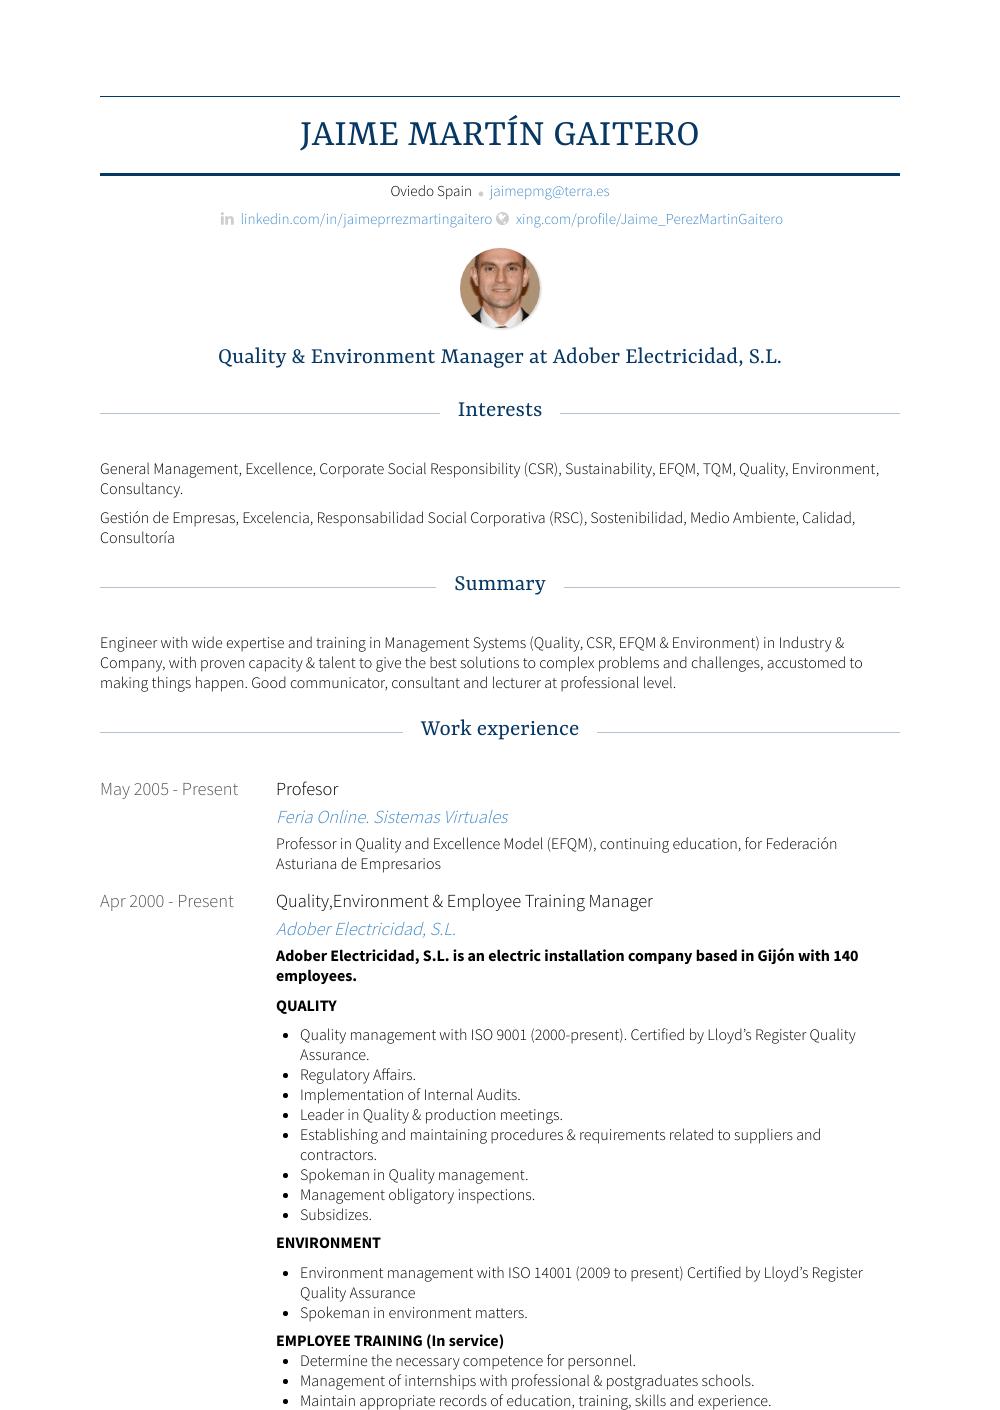 Profesor Resume Sample